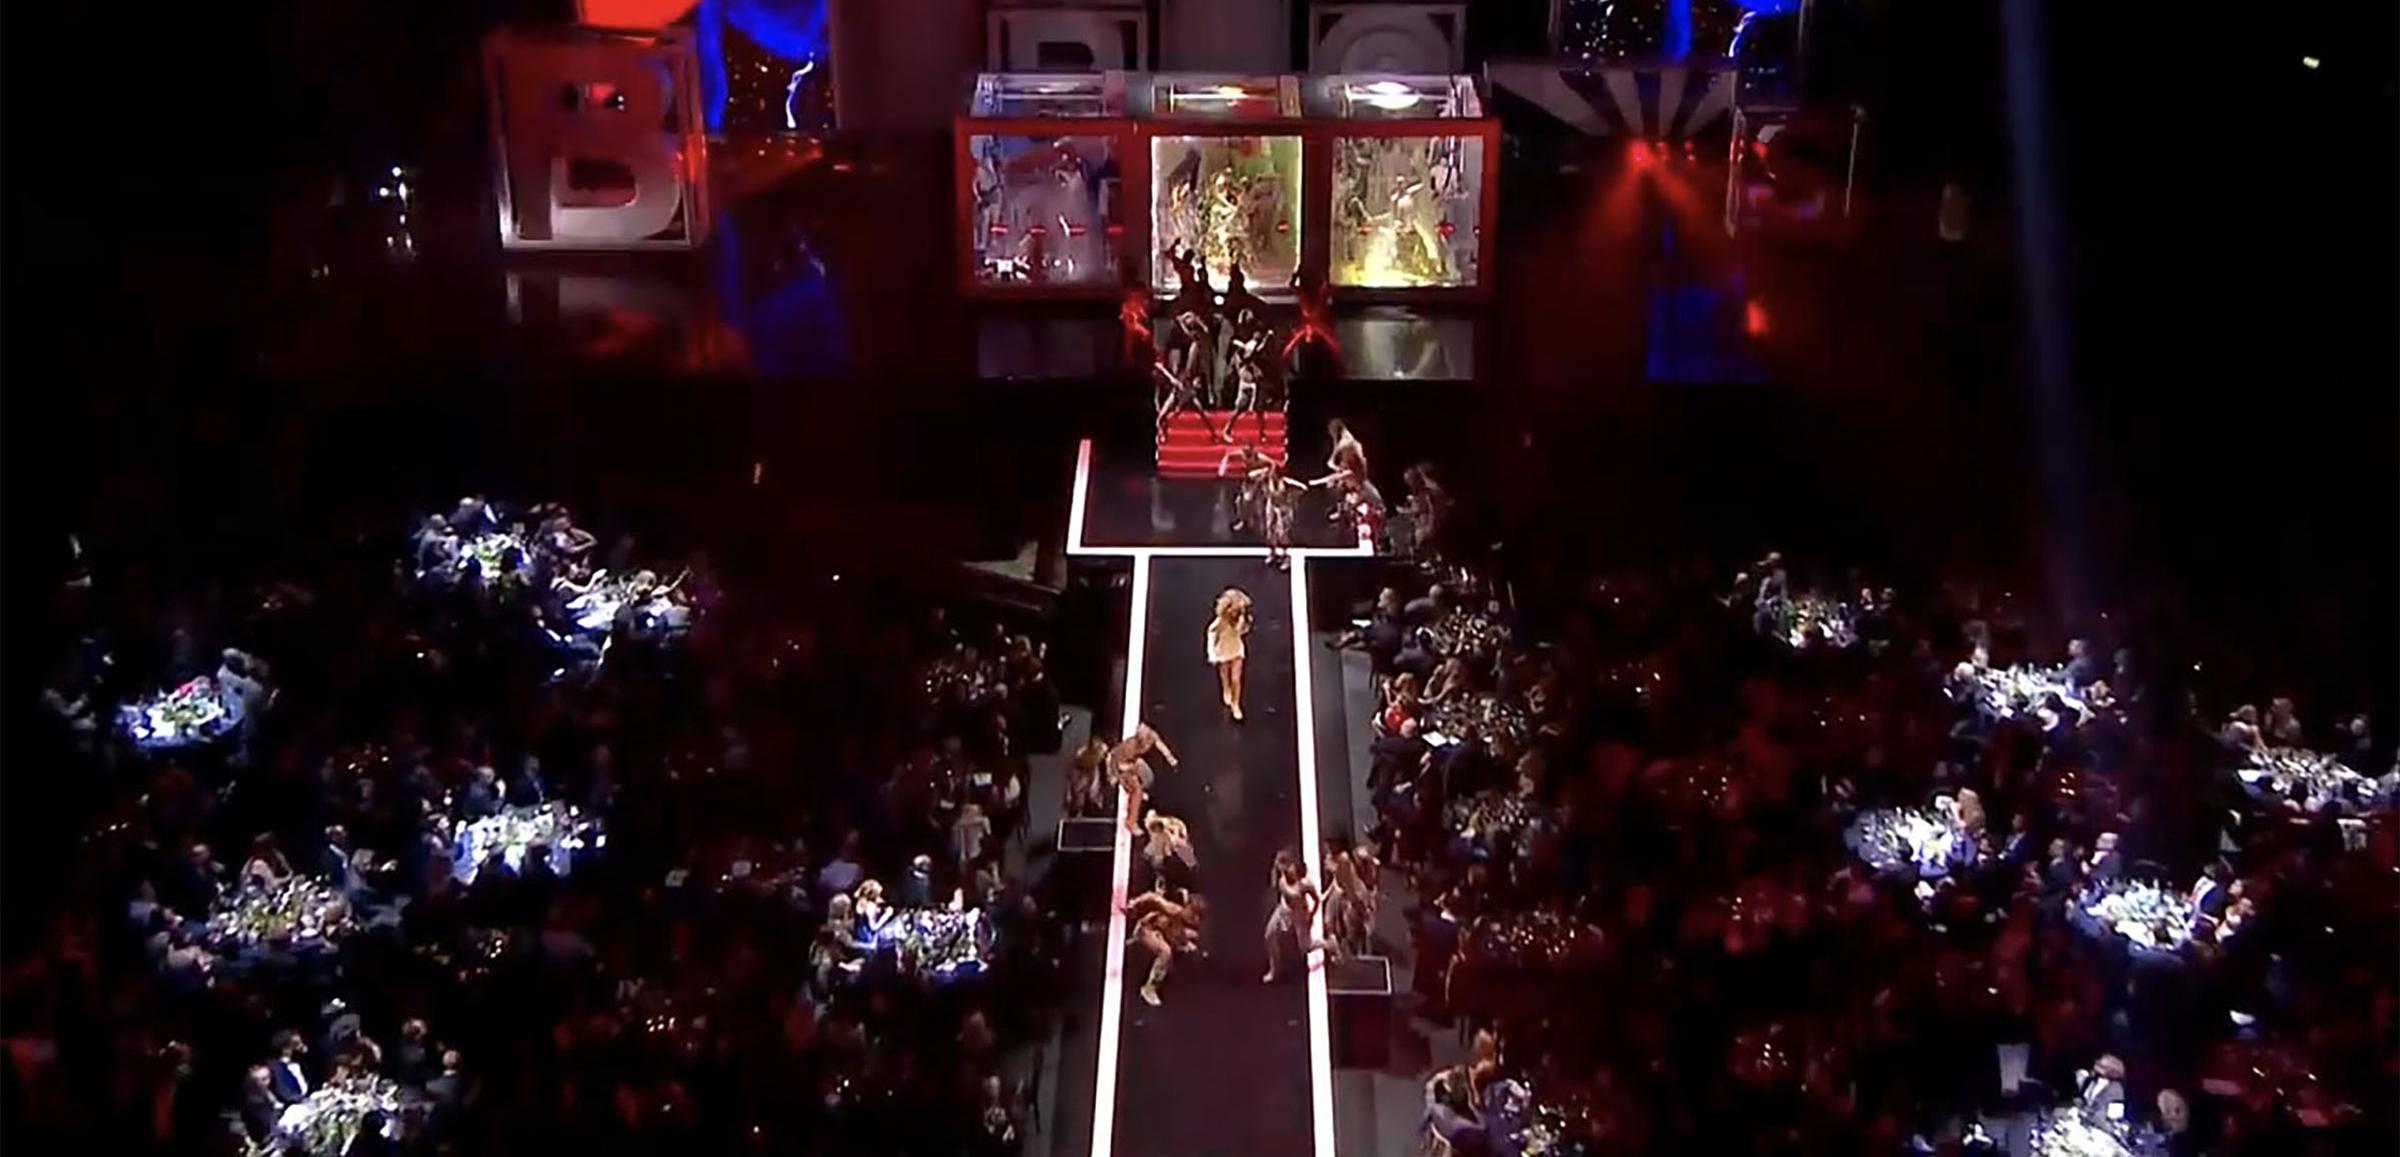 Luke Halls Studio — Rihanna, Brit Awards 2012